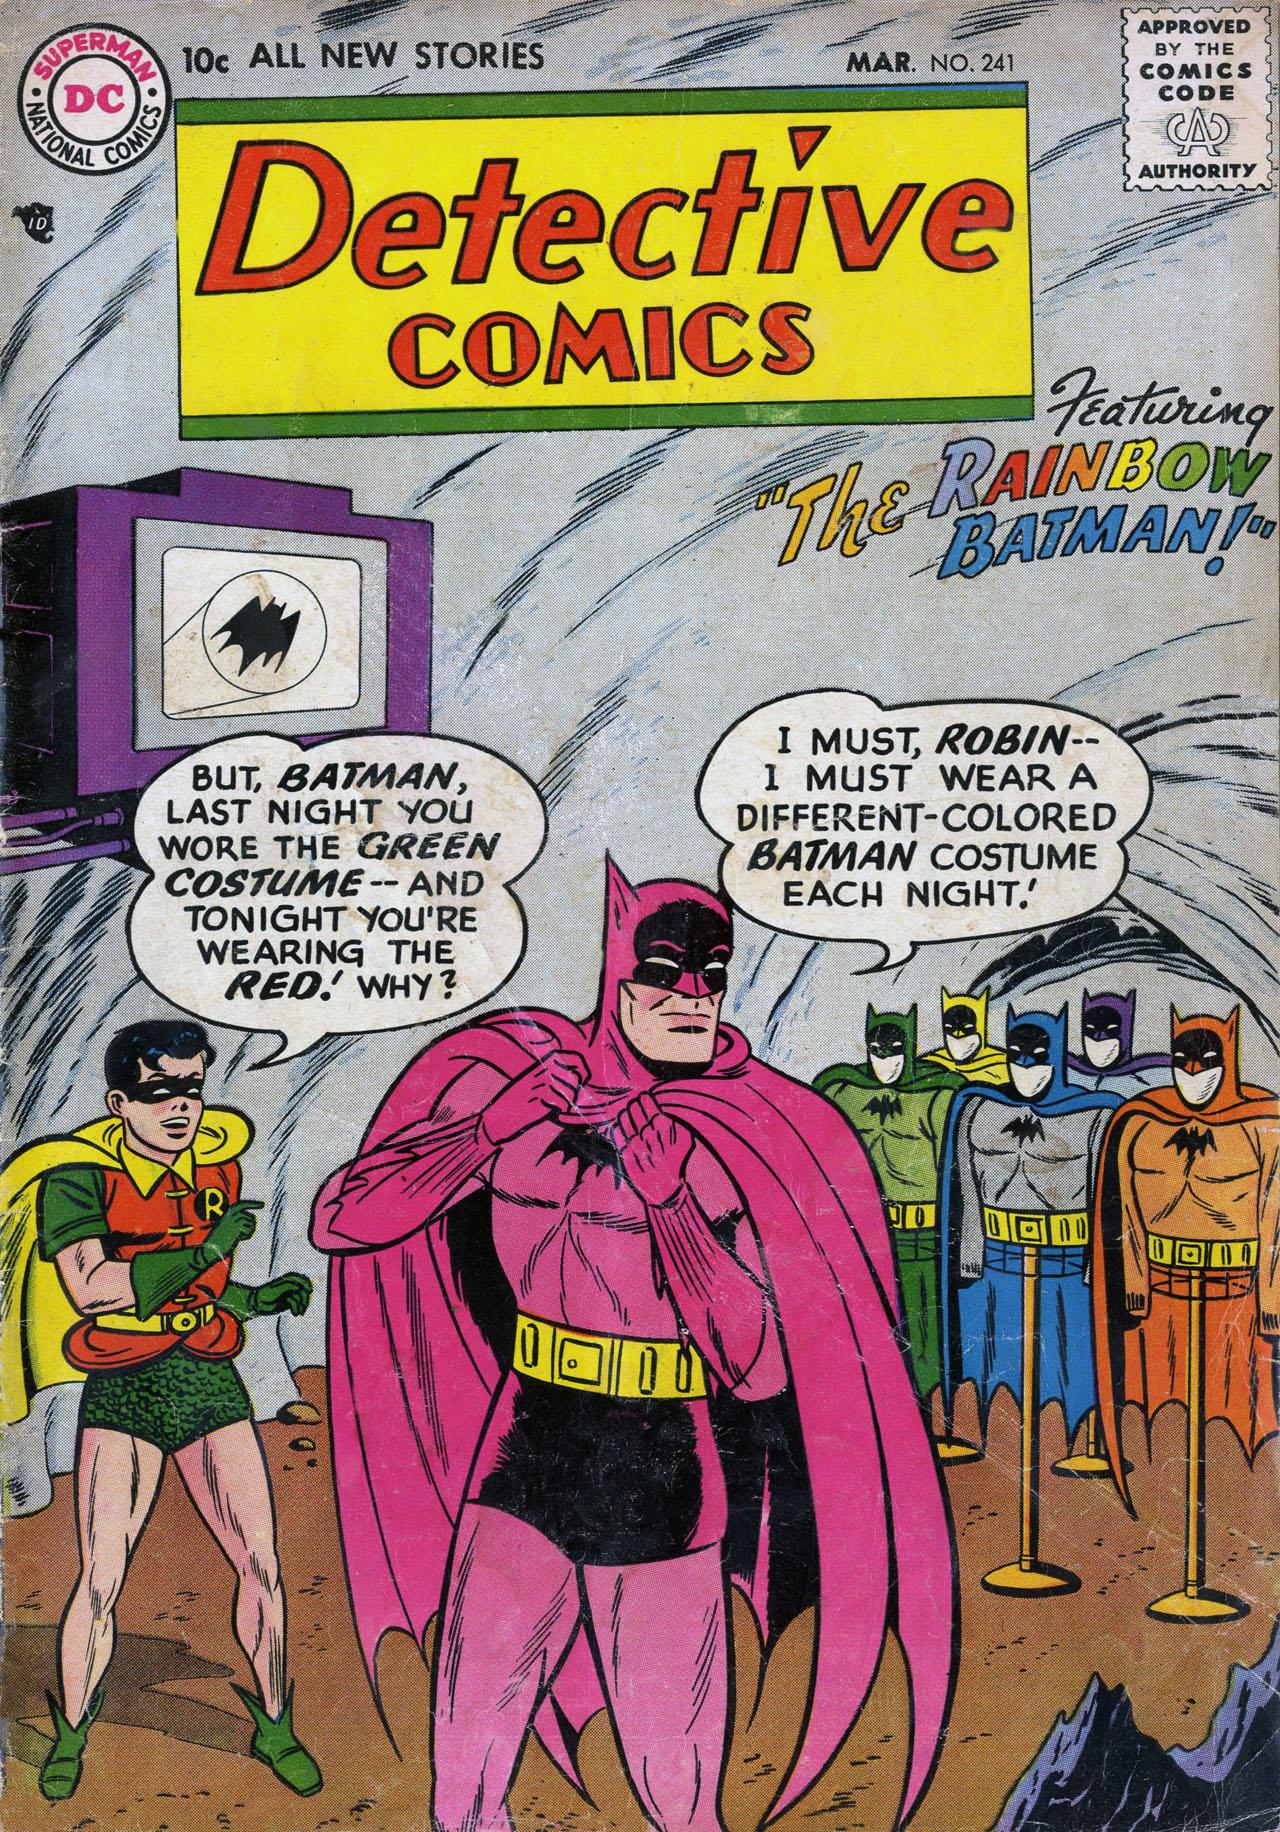 Detective Comics (1937) 241 Page 1